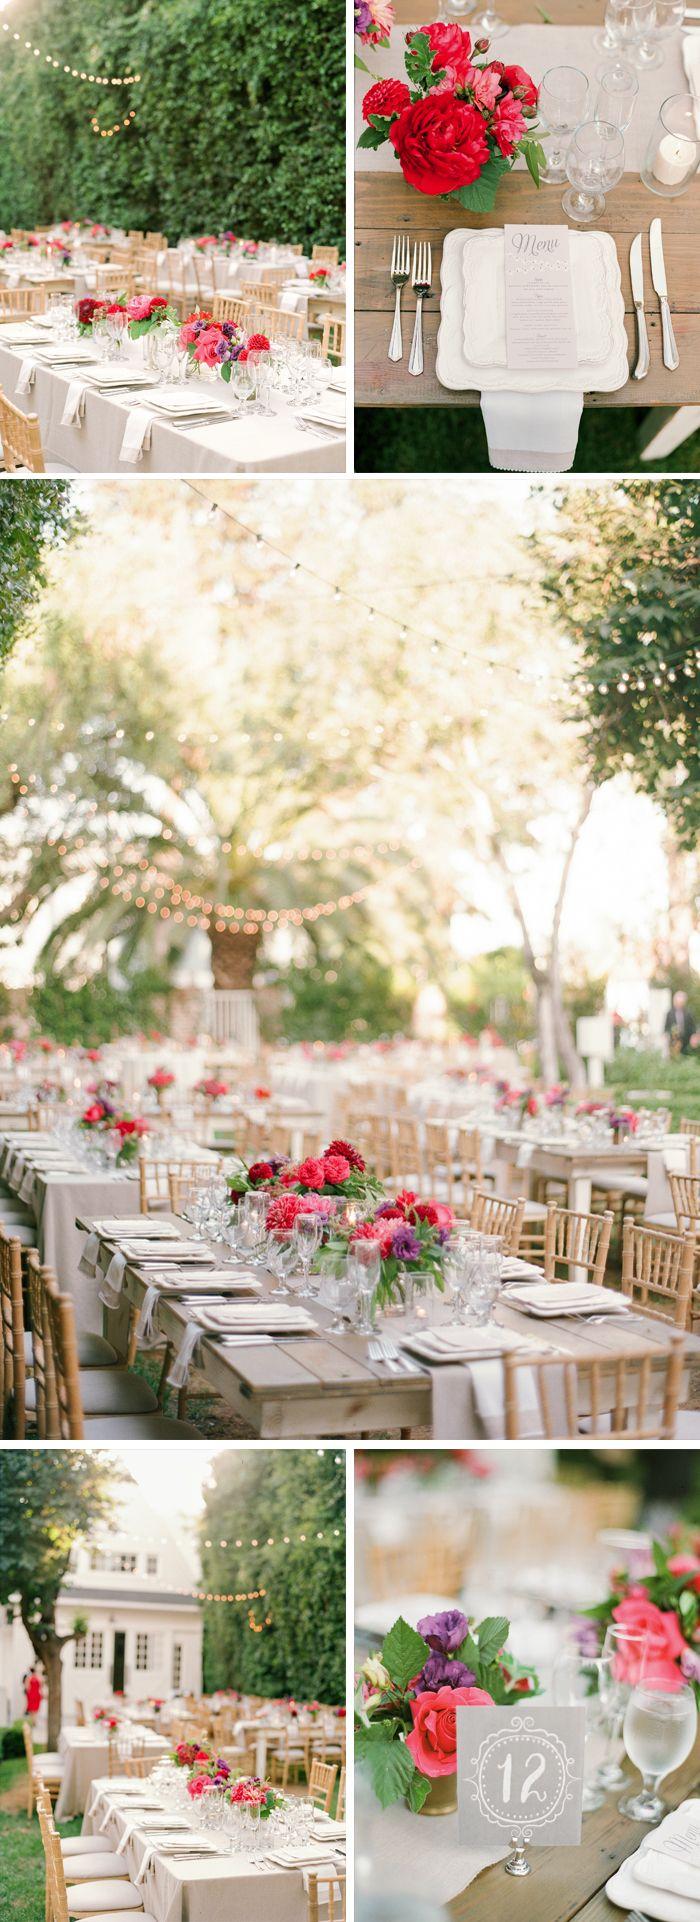 Julie & Eric Lombardi House | Pinterest | Barn table, White barn and ...